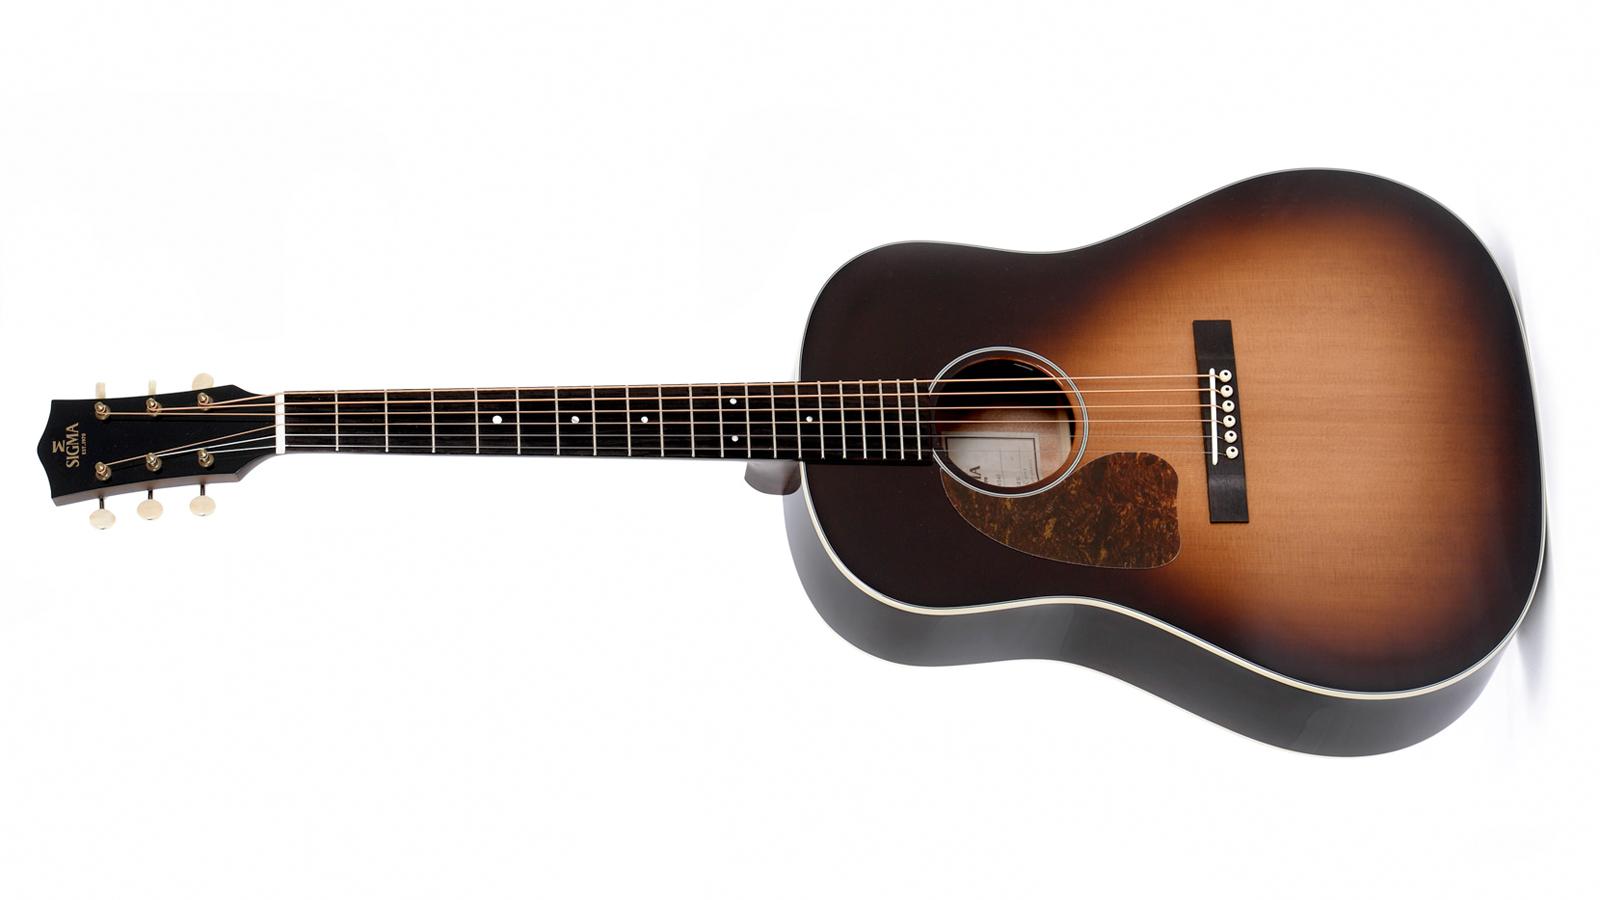 Sigma JM-SG45L+ Lefthand Westerngitarre